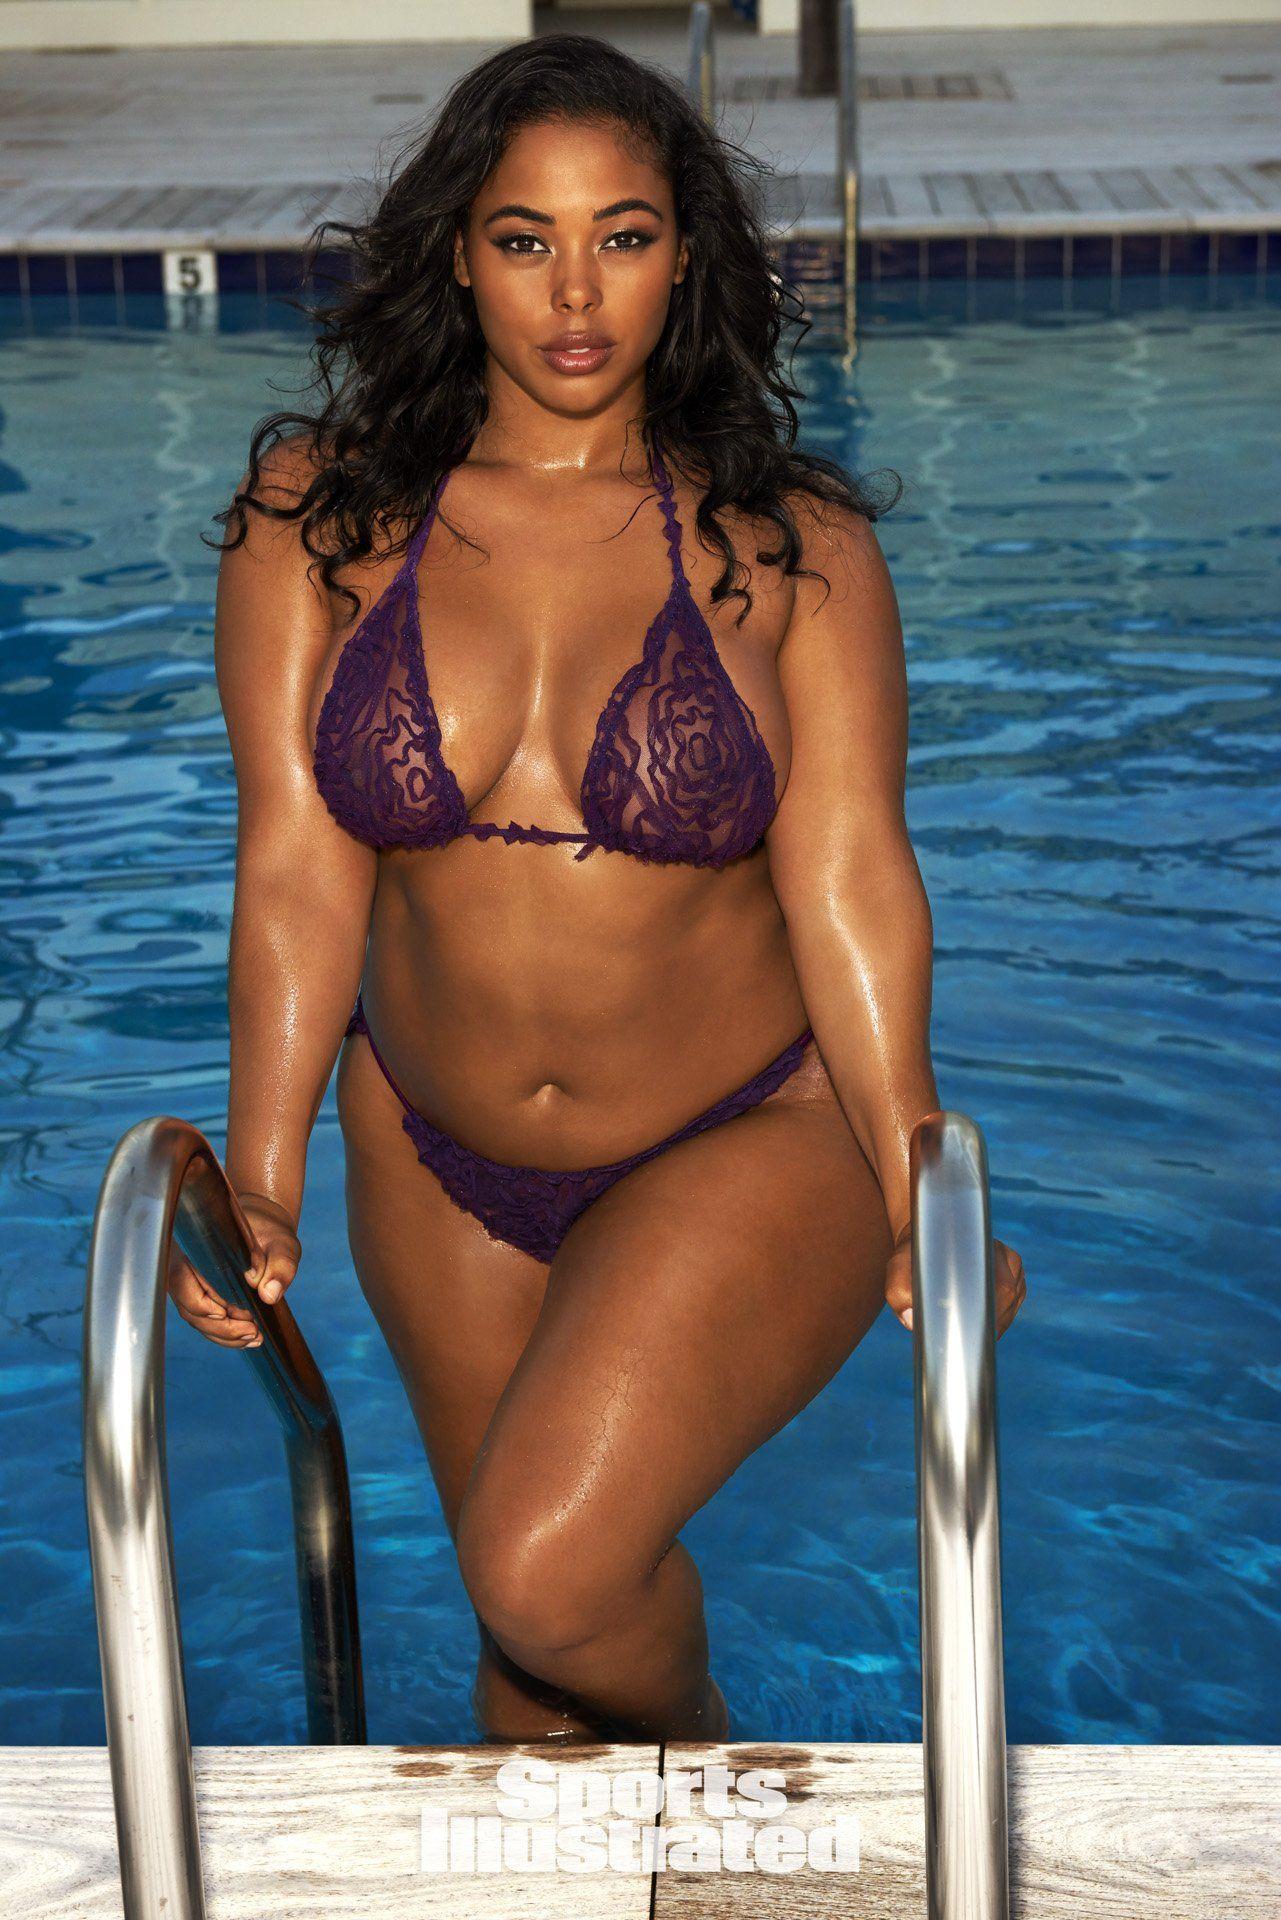 modle Plus pictures bikini size